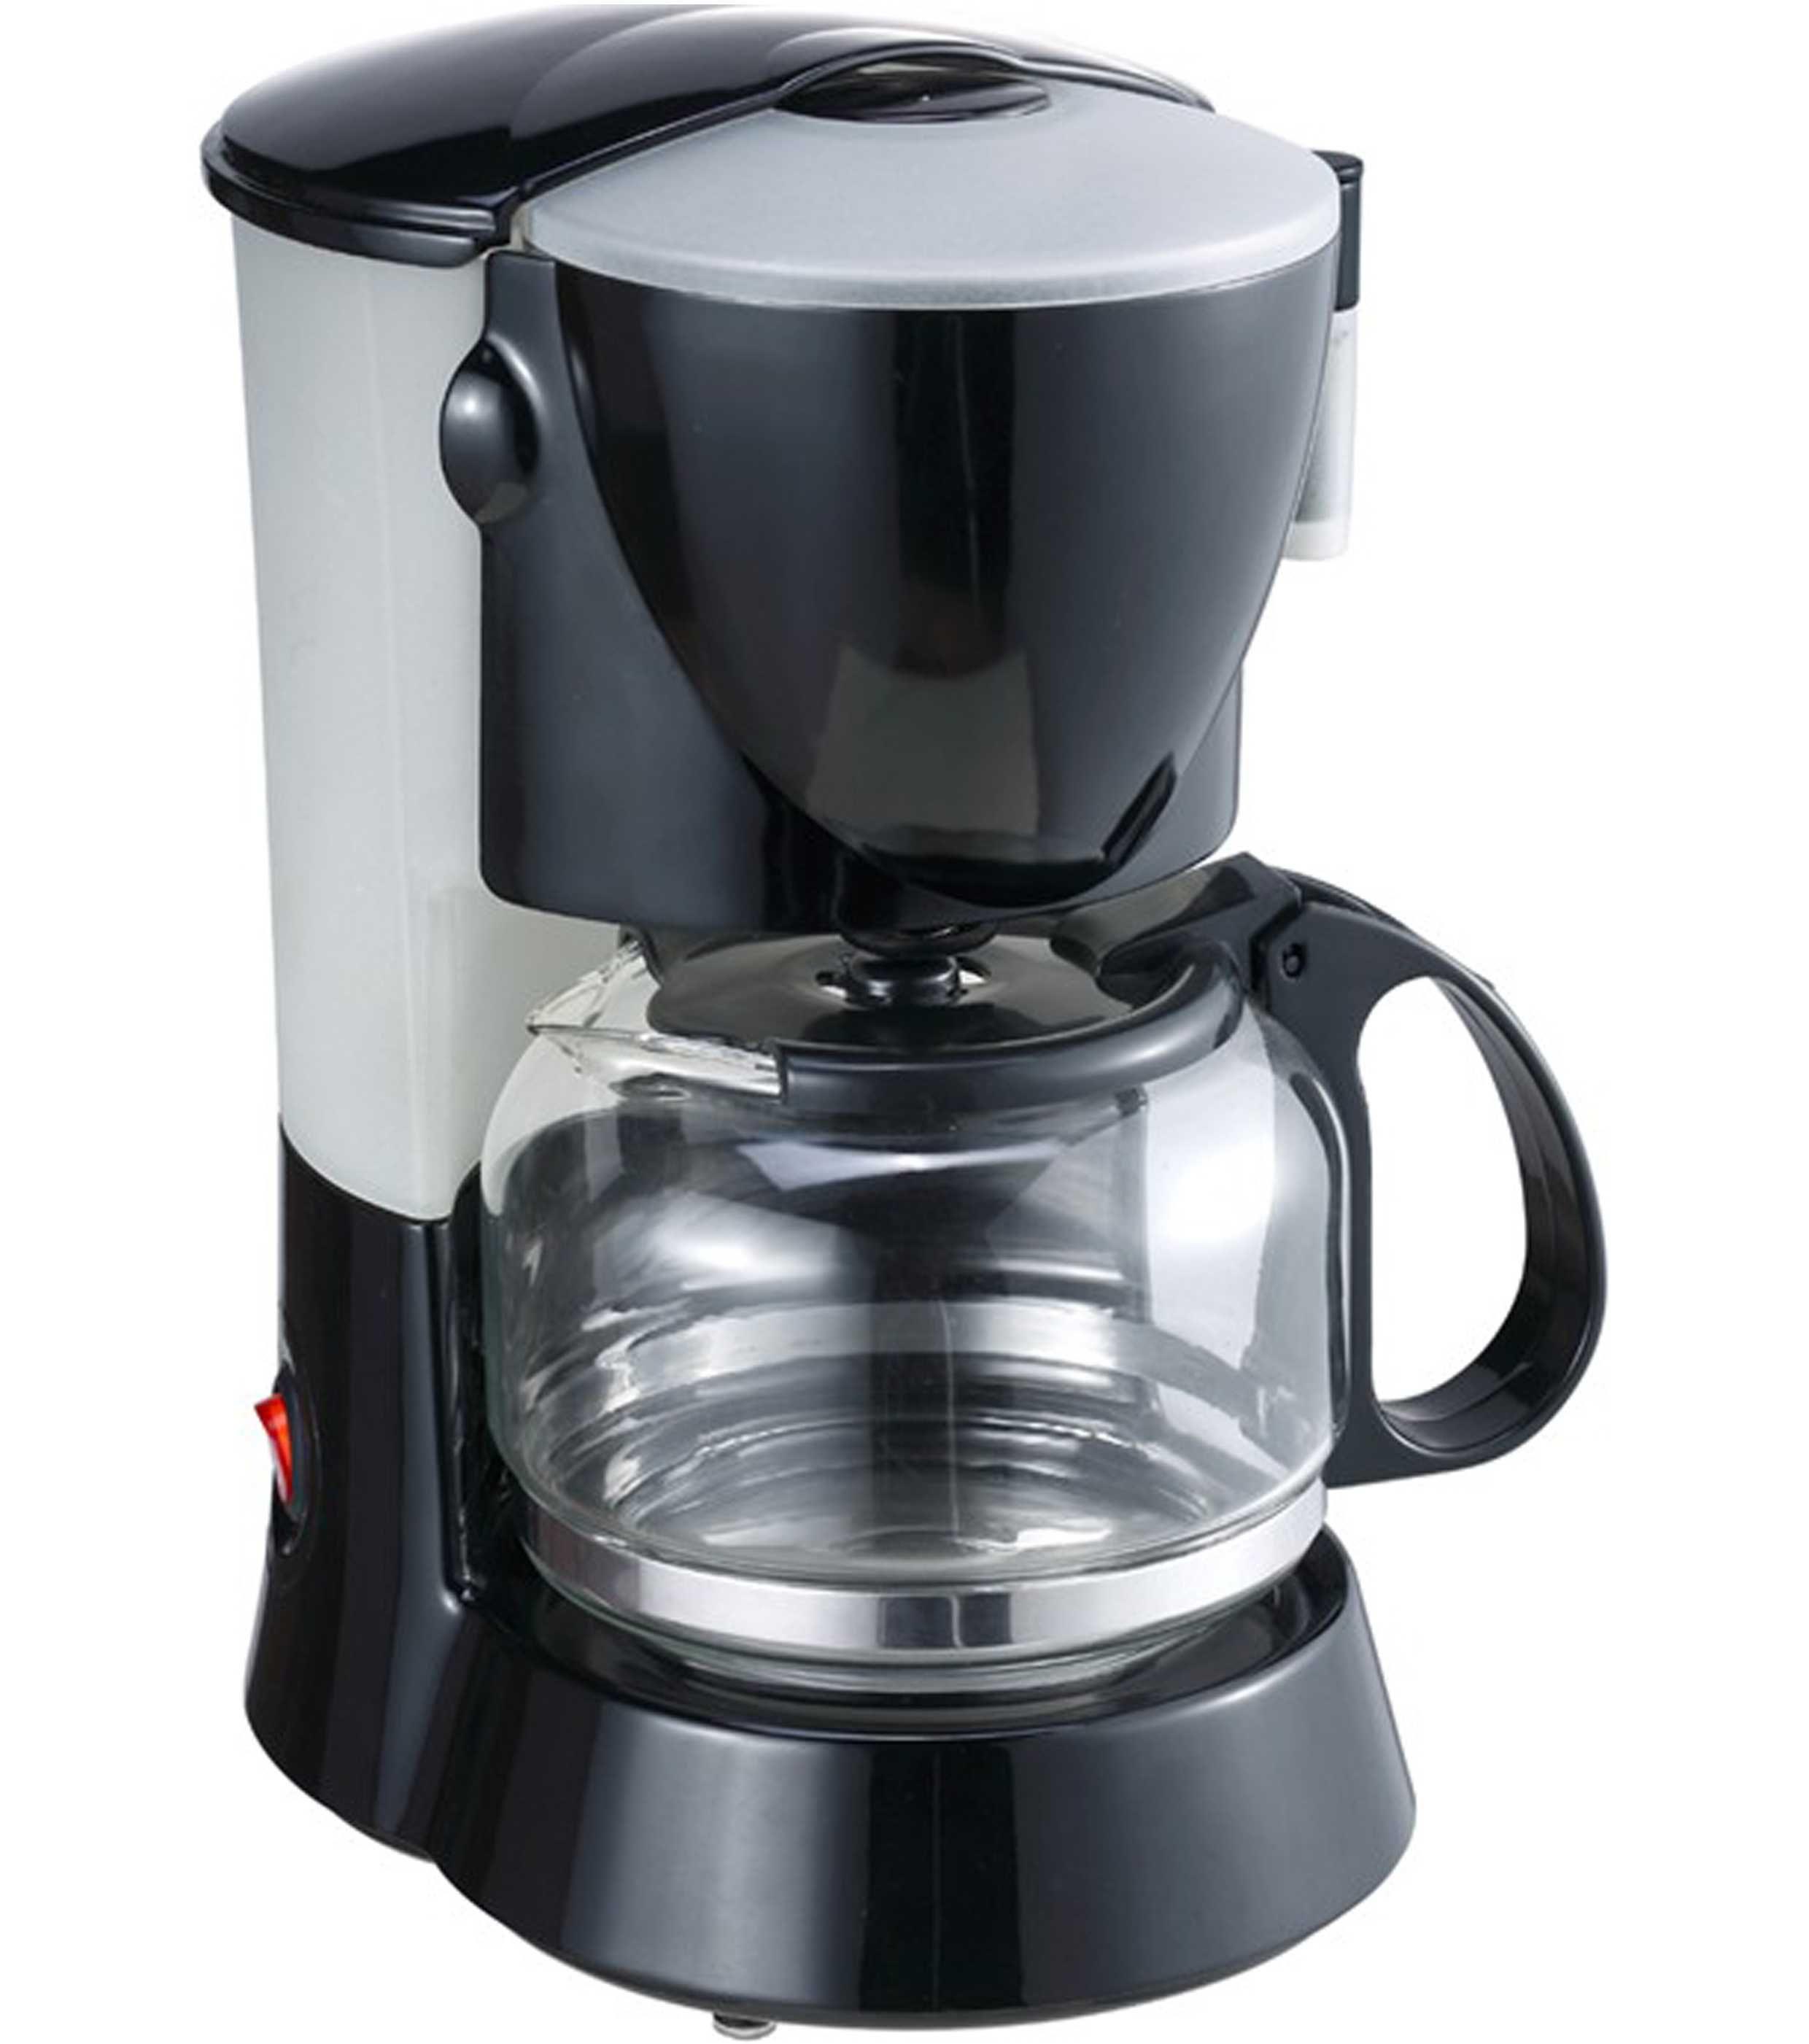 coffee maker Coffee maker, Drip coffee maker, Coffee